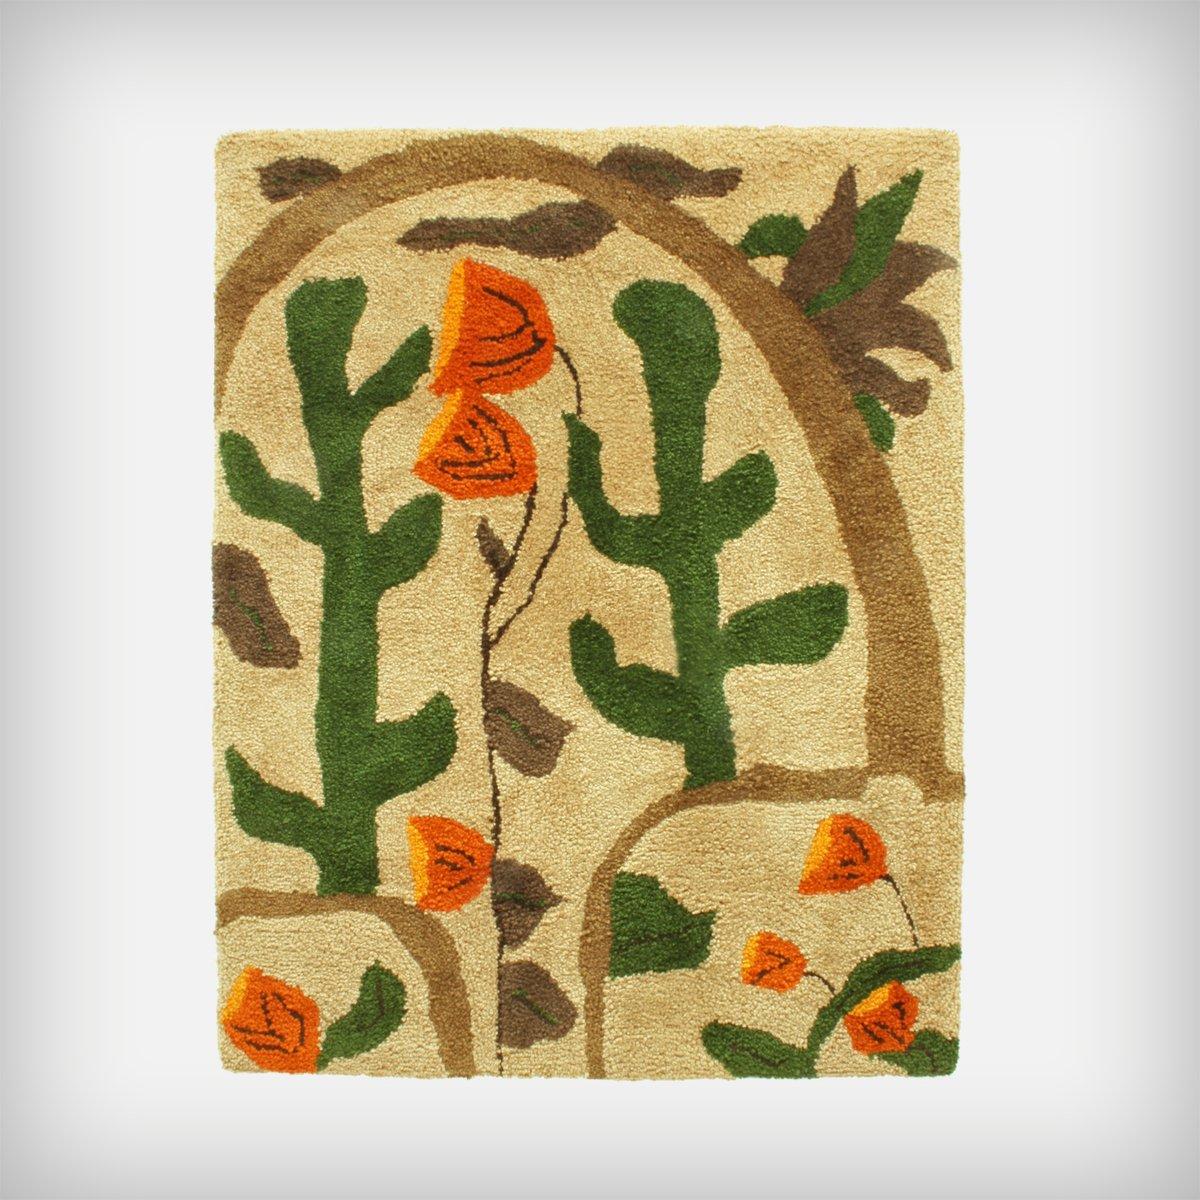 gro er bunter wandteppich mit kaktus blumenlandschaft. Black Bedroom Furniture Sets. Home Design Ideas